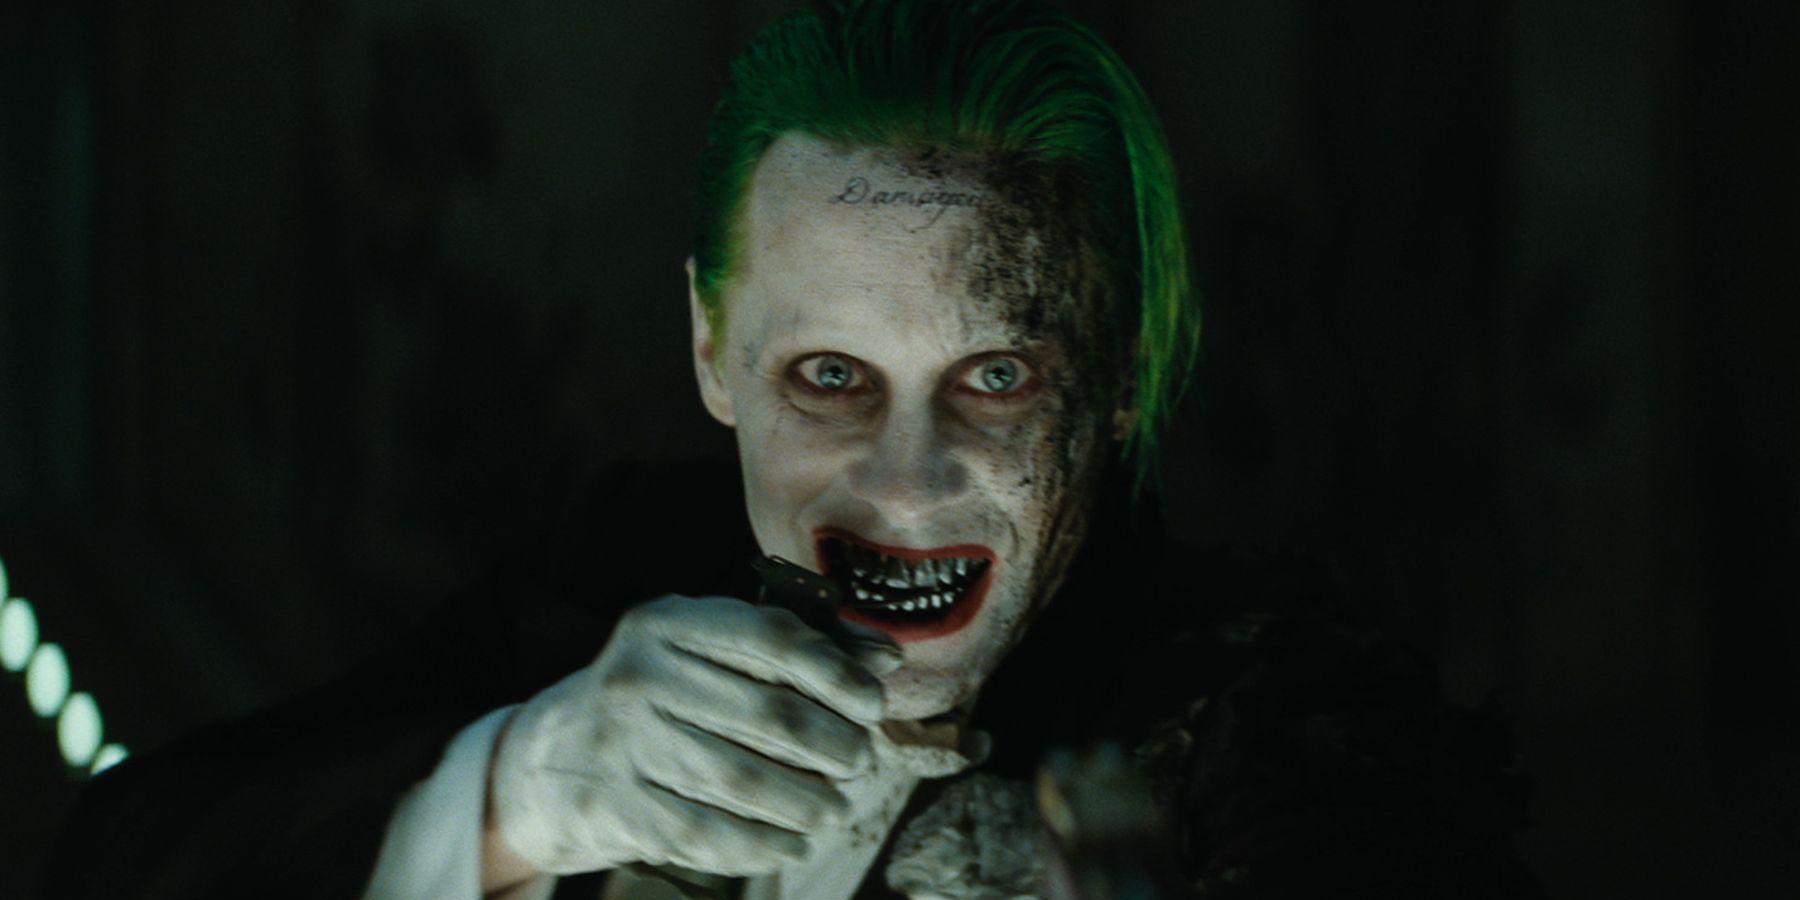 Joker (The Dark Knight) - Wikipedia